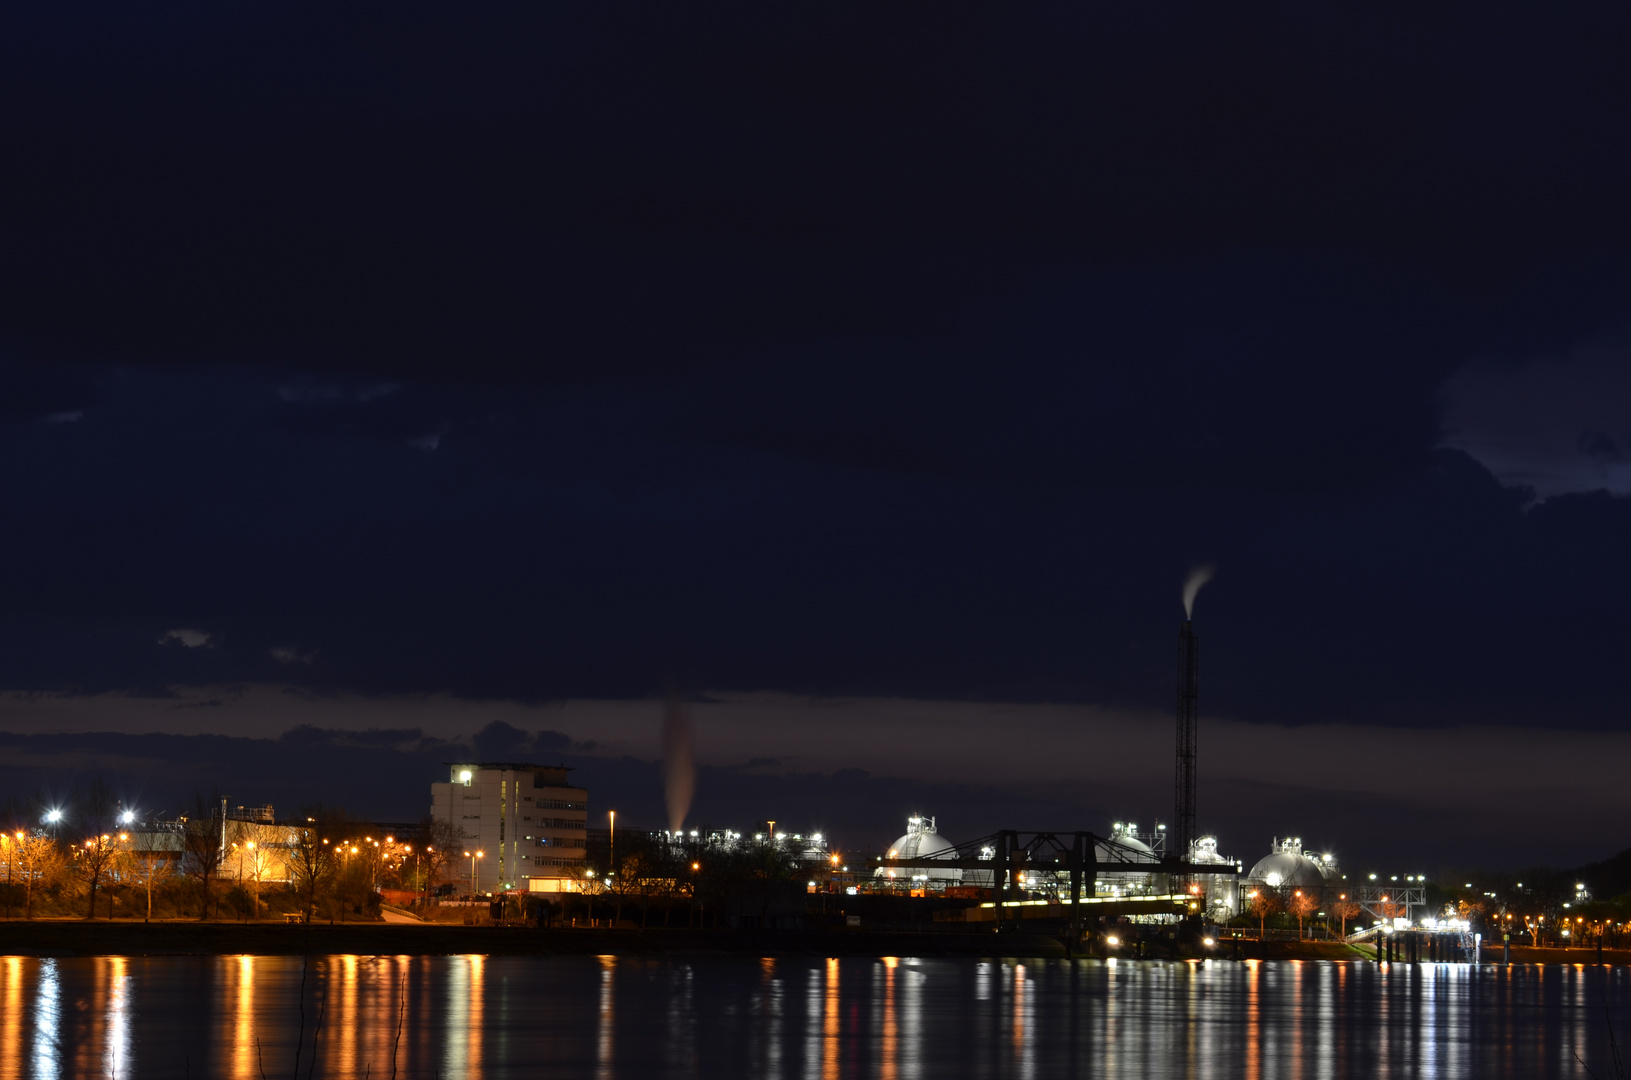 BASF bei Nacht 2